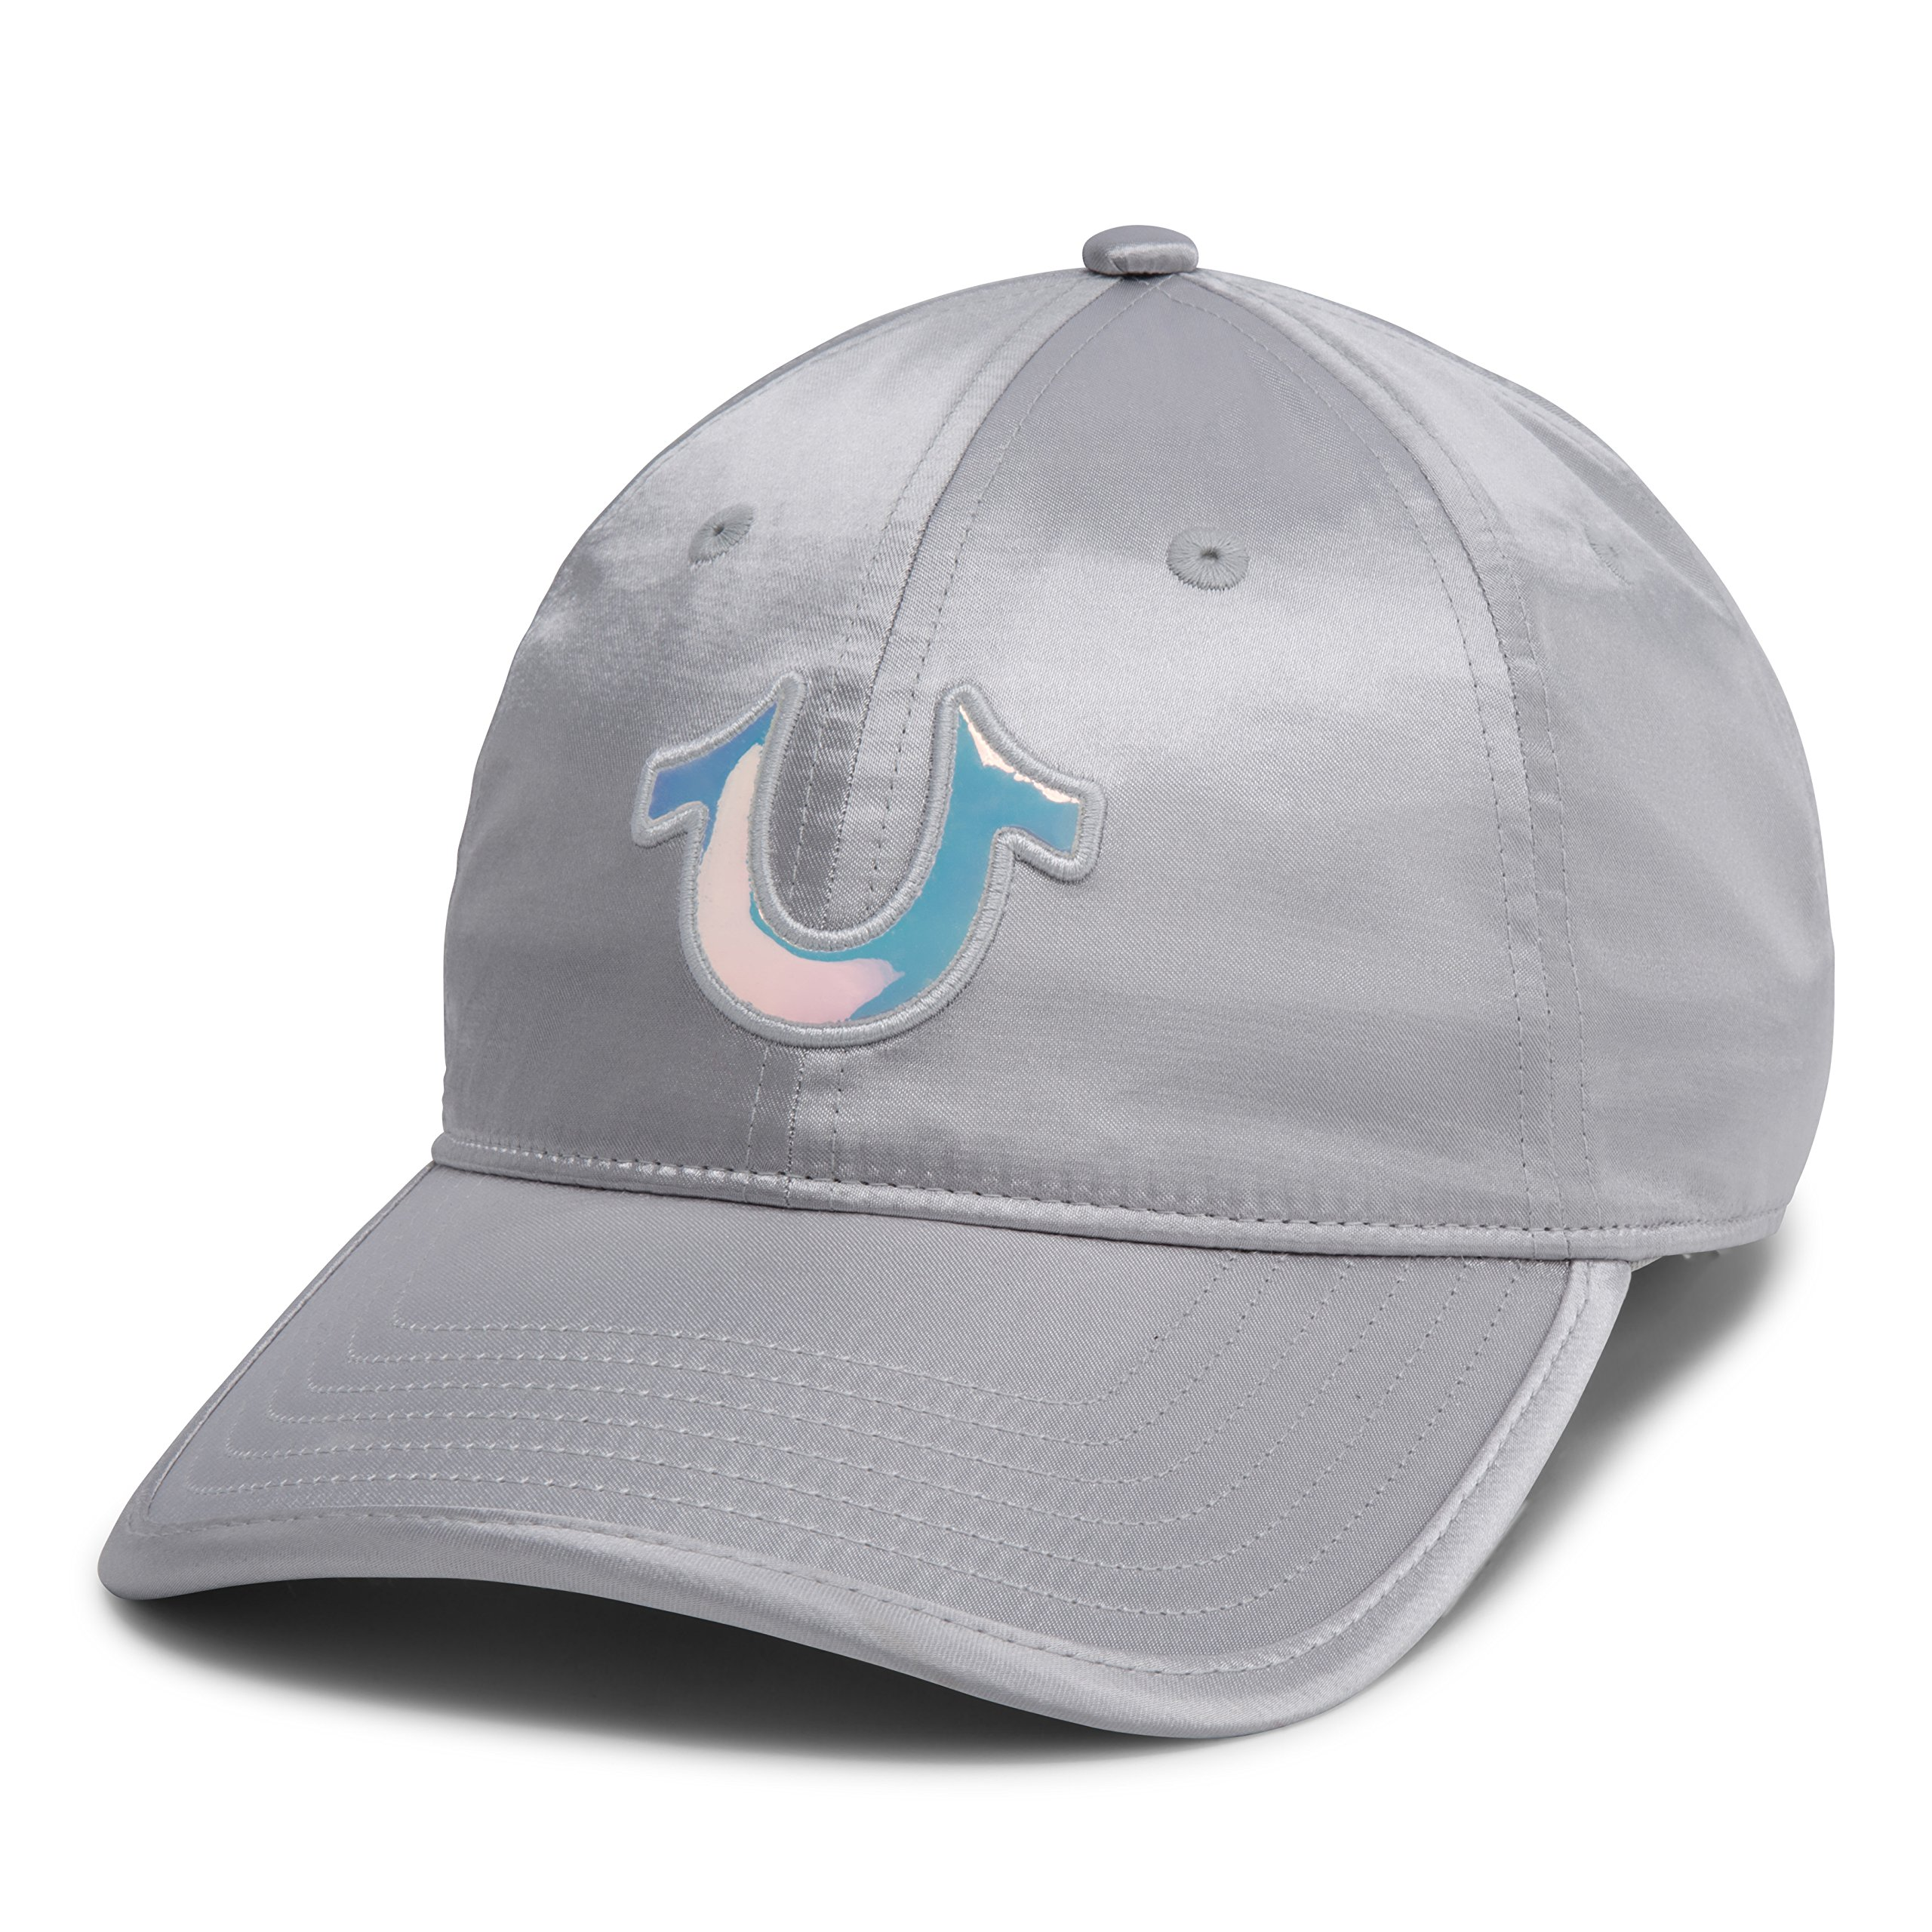 True Religion Women's Satin Baseball Cap, Silver OSFA